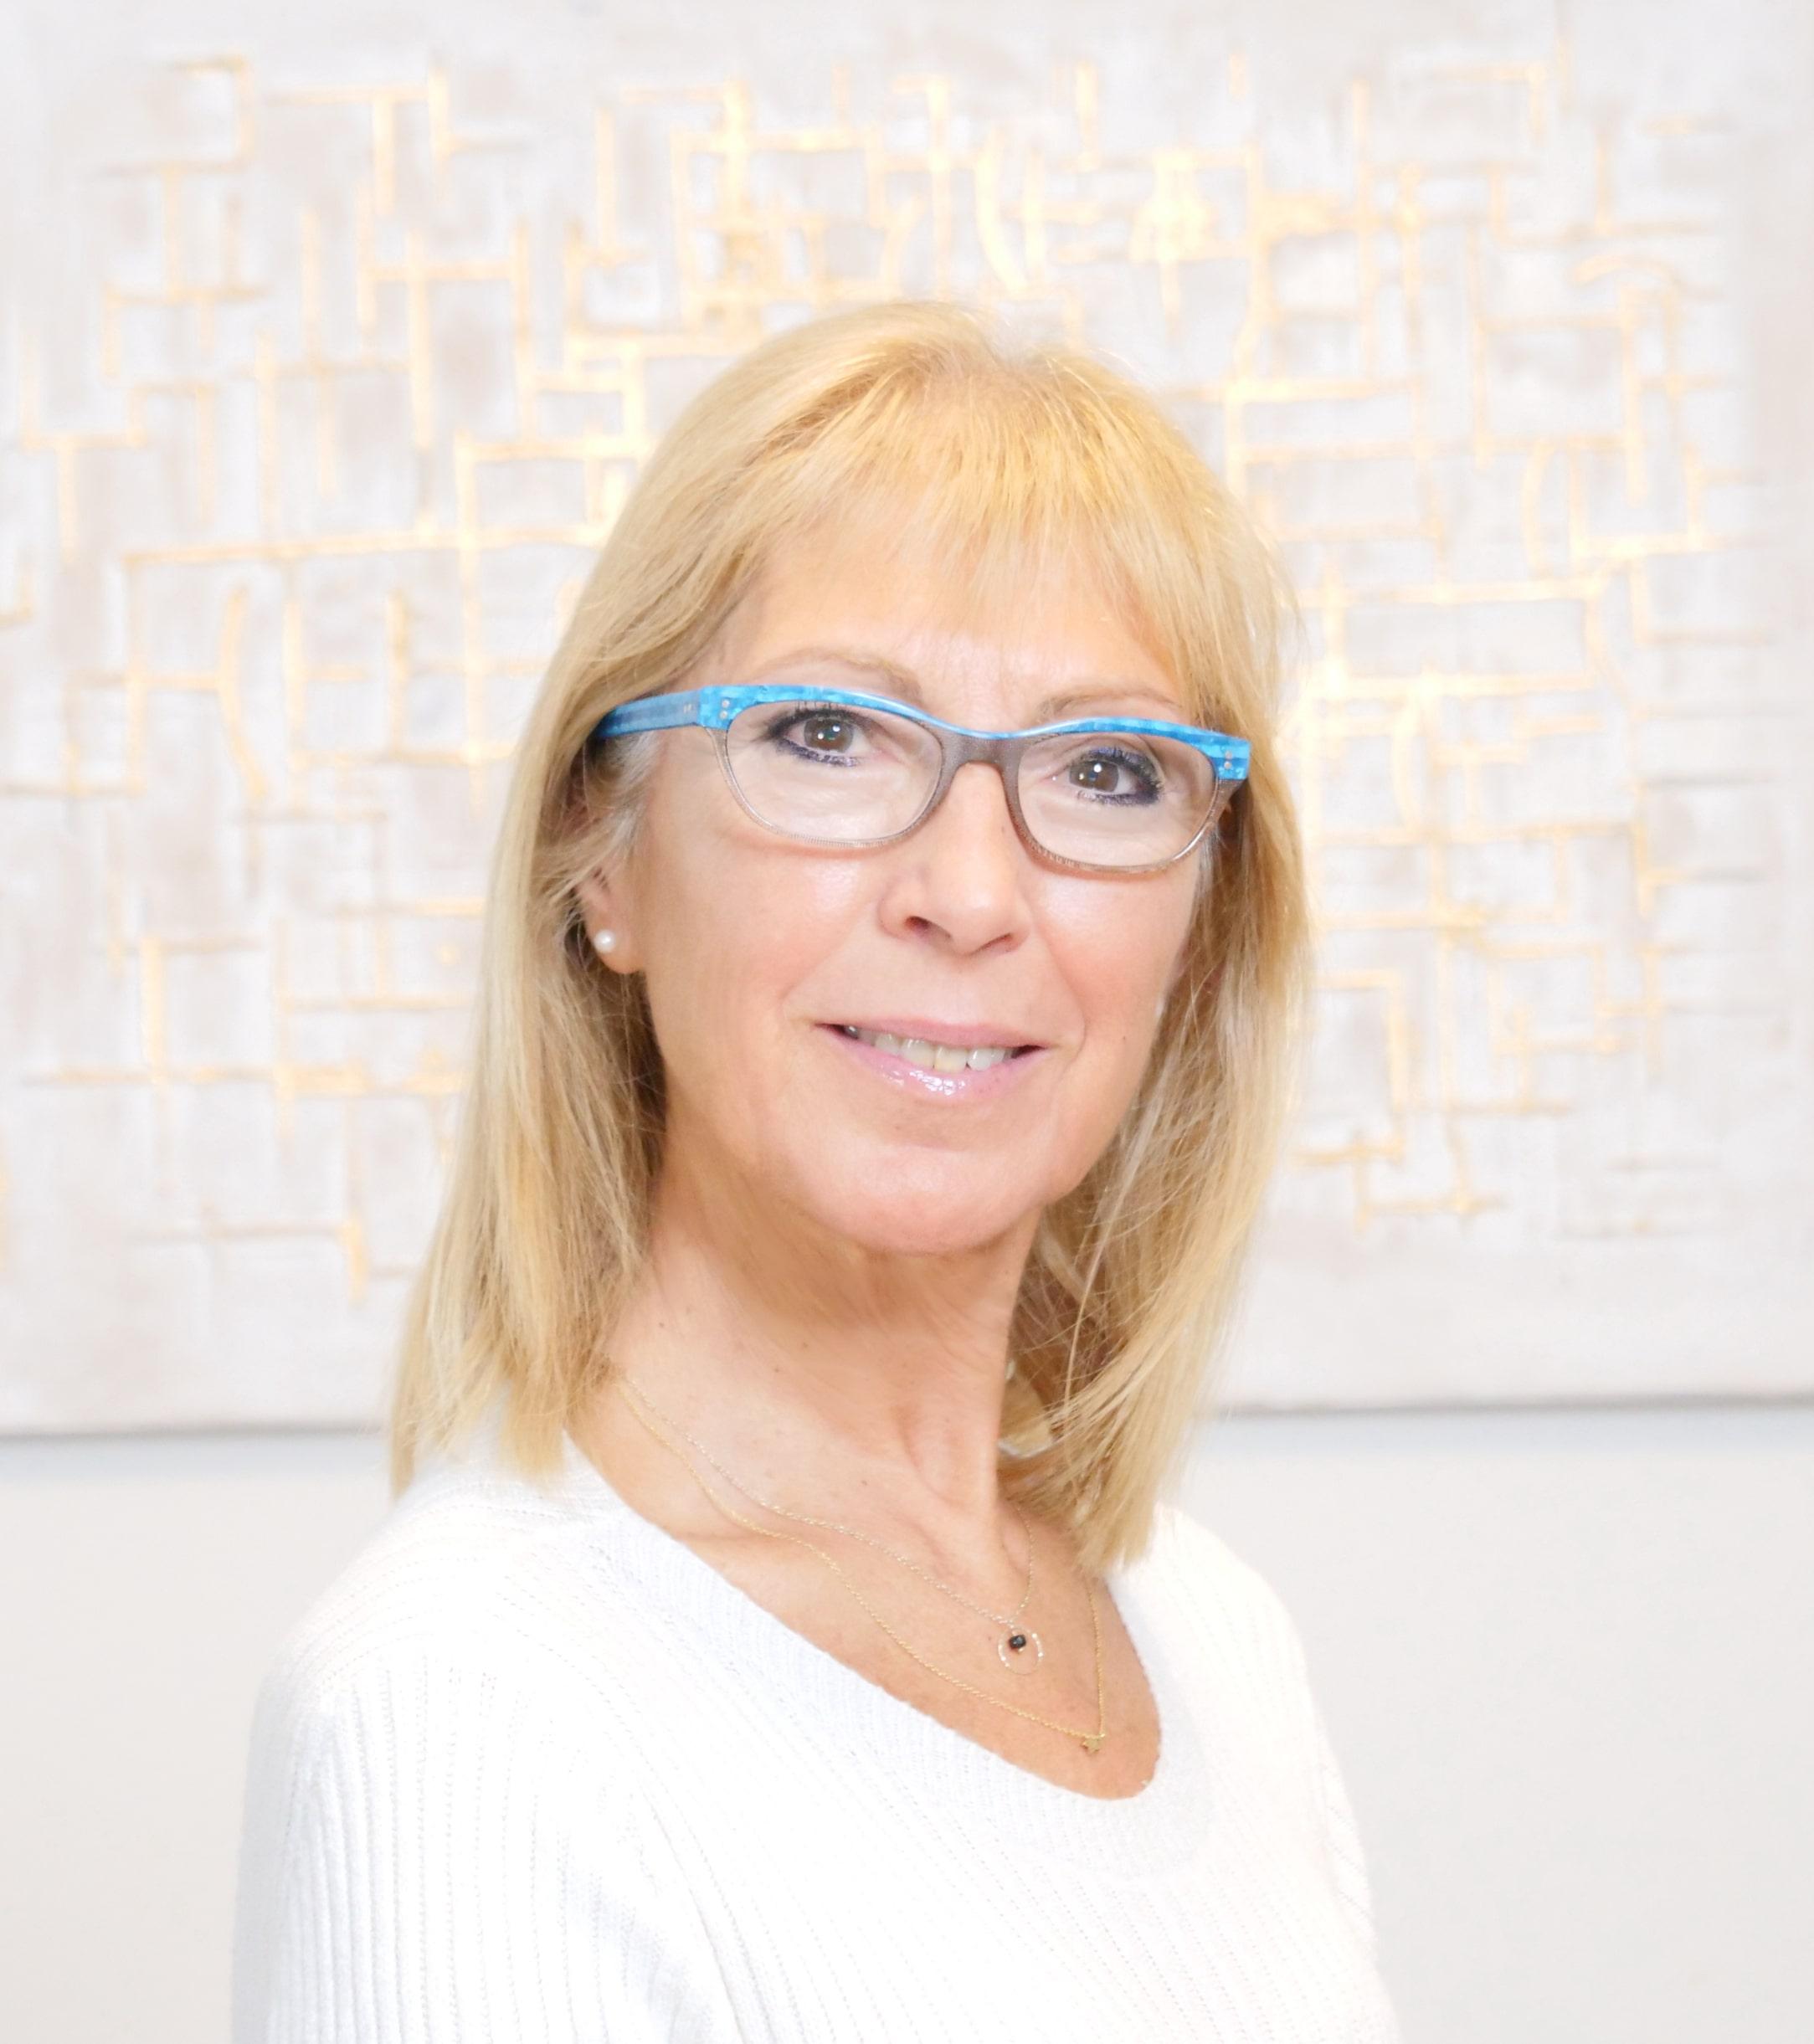 CAÑABATE ORTIZ, MARIA DOLORES